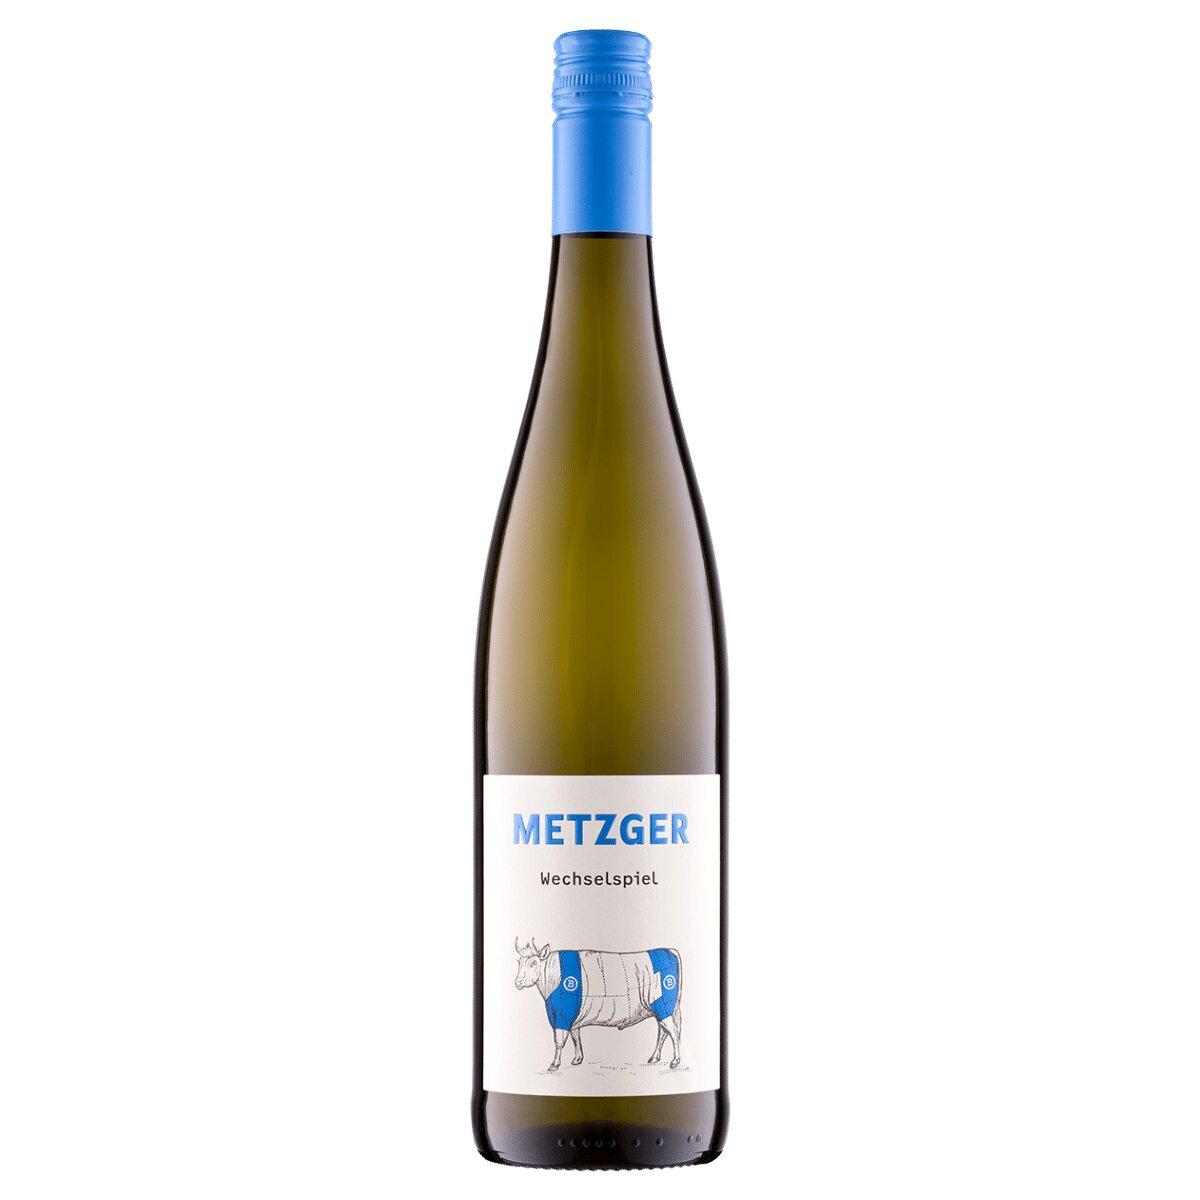 Metzger Wechselspiel - Weingut Uli Metzger - , , , ,